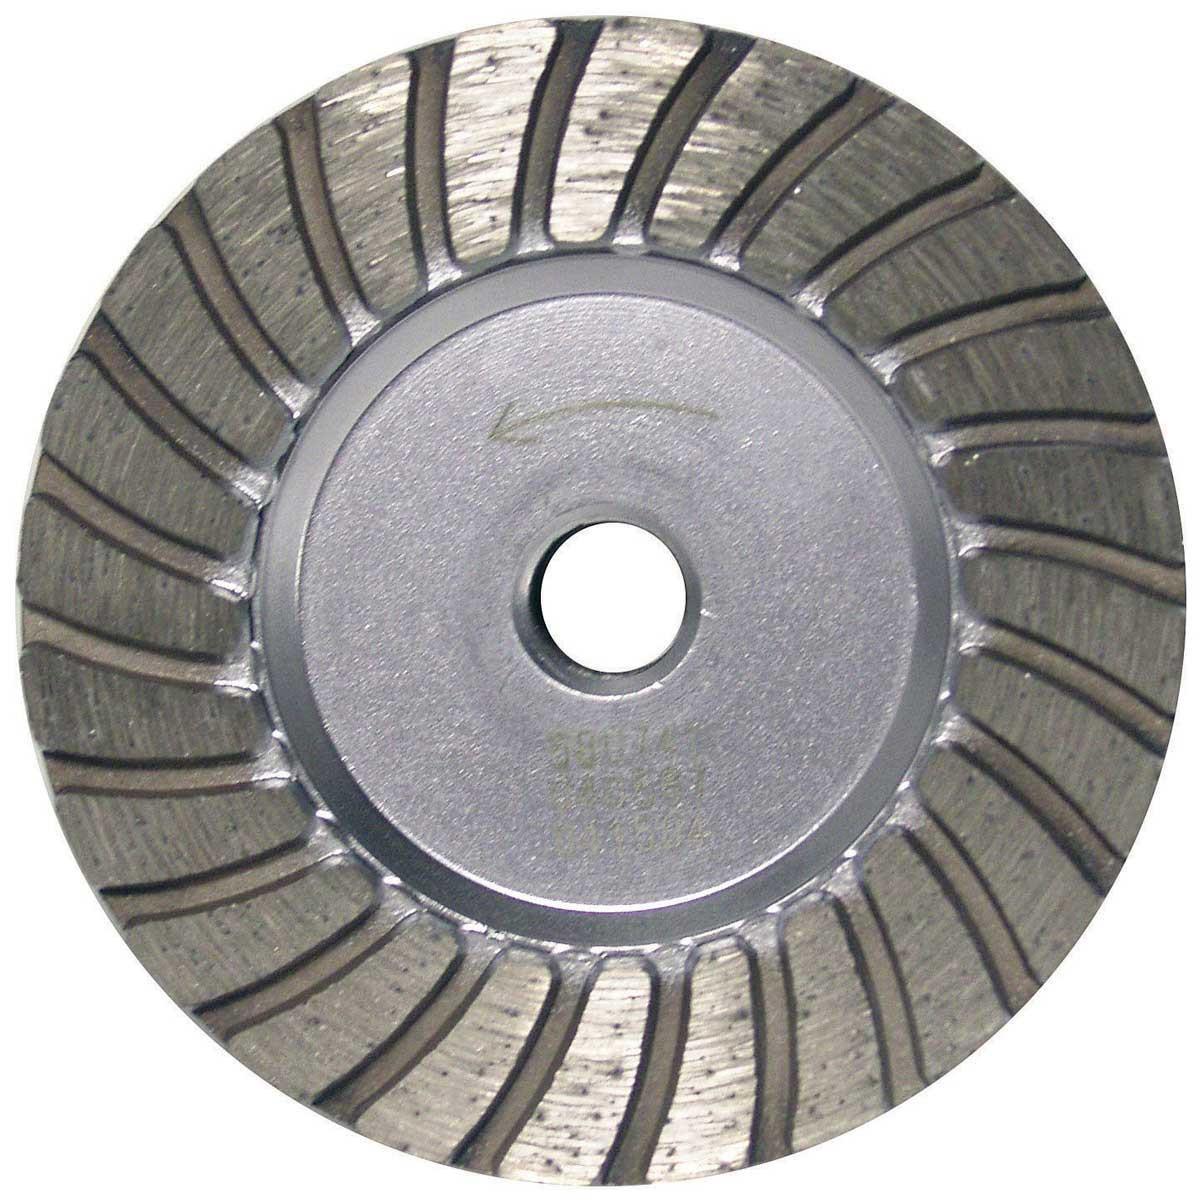 4 Quot Turbo Diamond Cup Wheel Contractors Direct